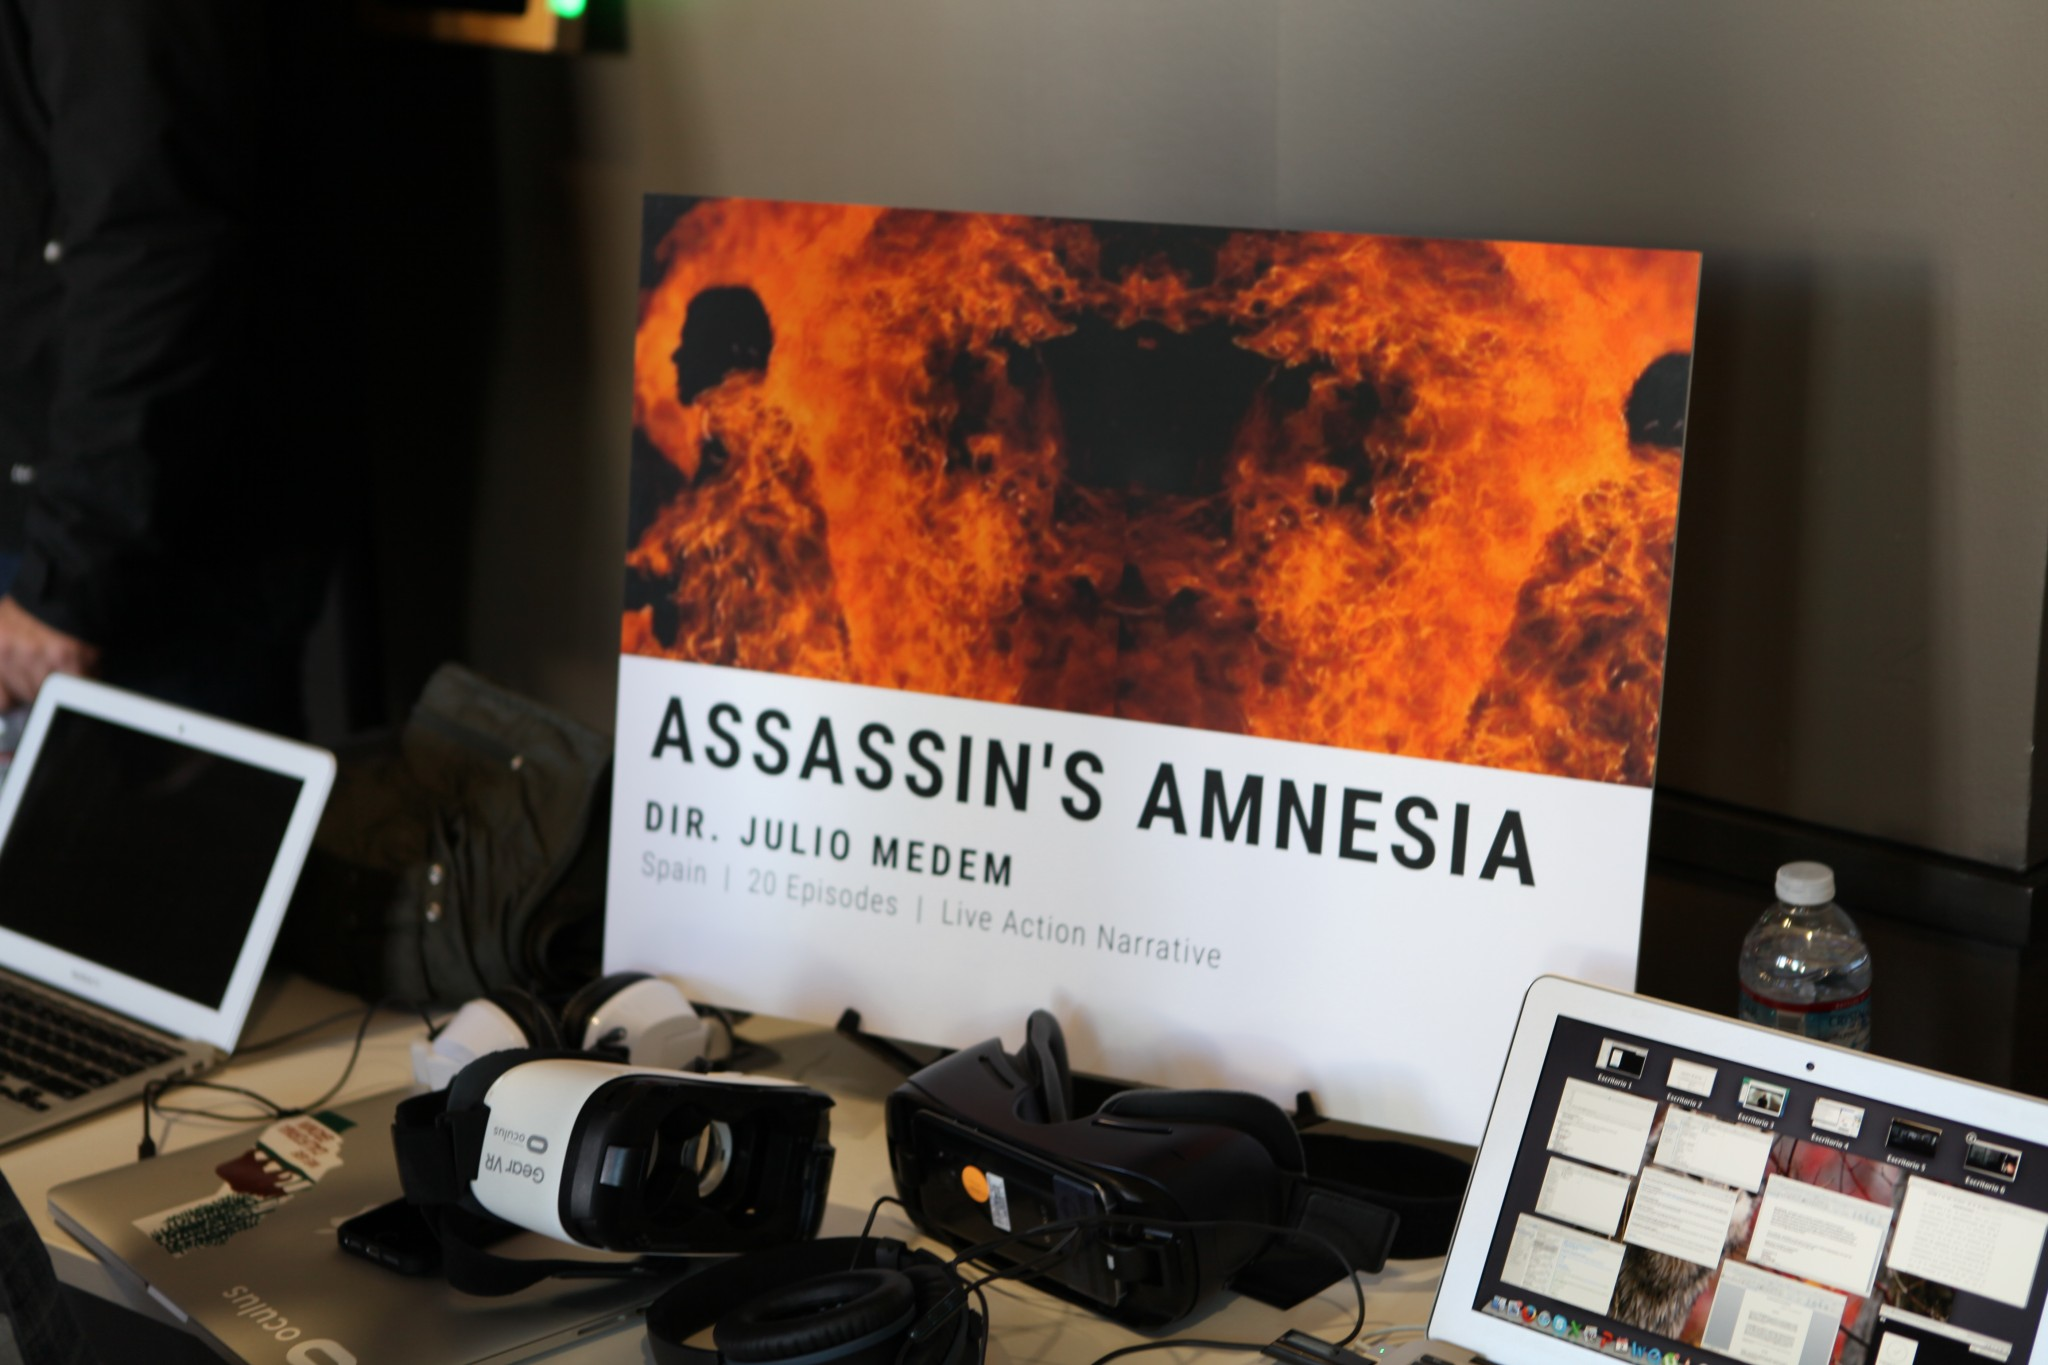 The Assassin's Amnesia demo booth.